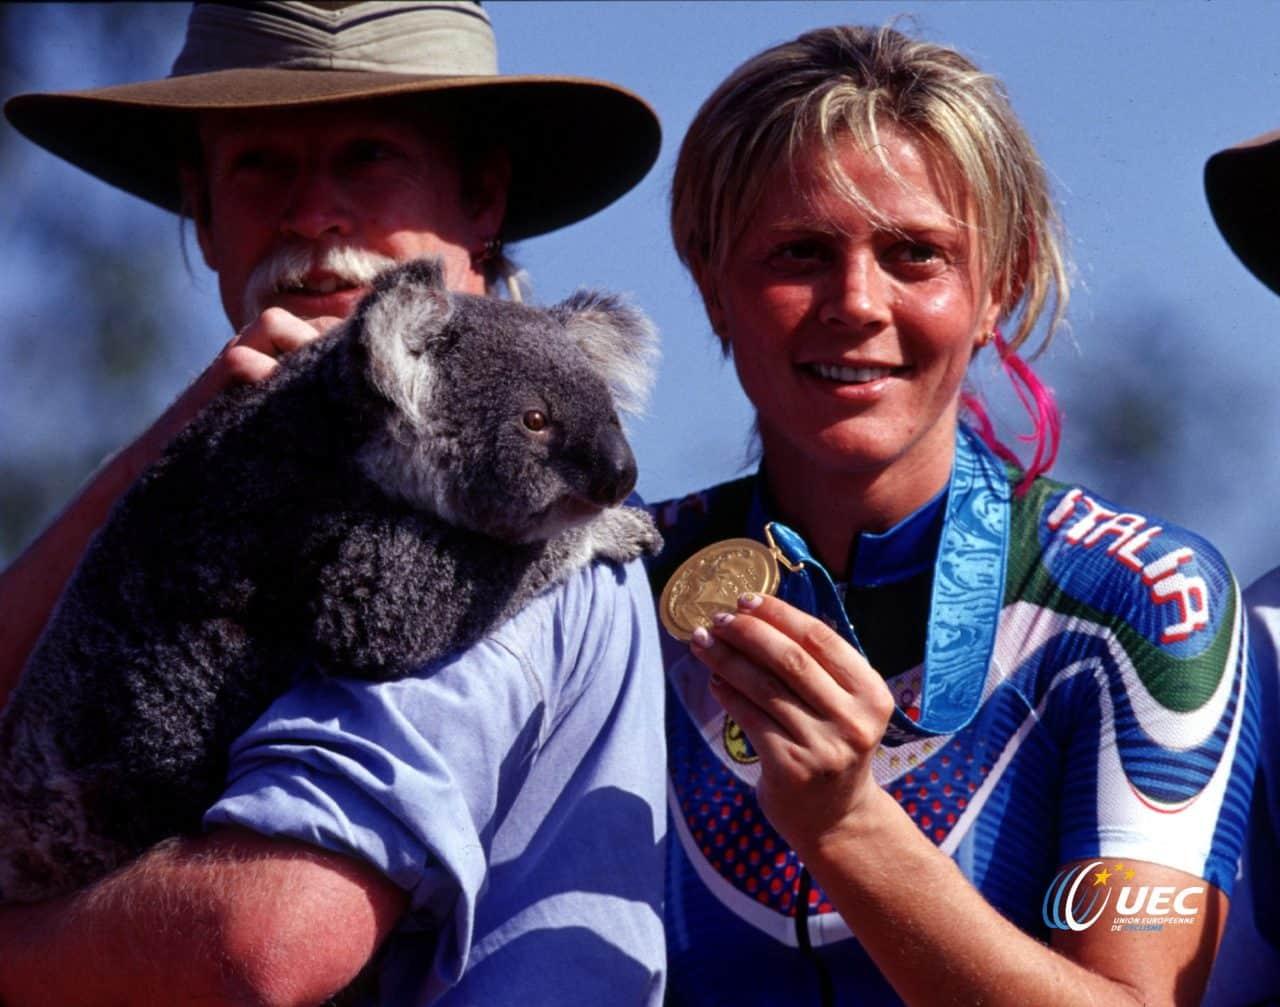 Paola Pezzo mountain bike jogos olímpicos olimpíada sydney